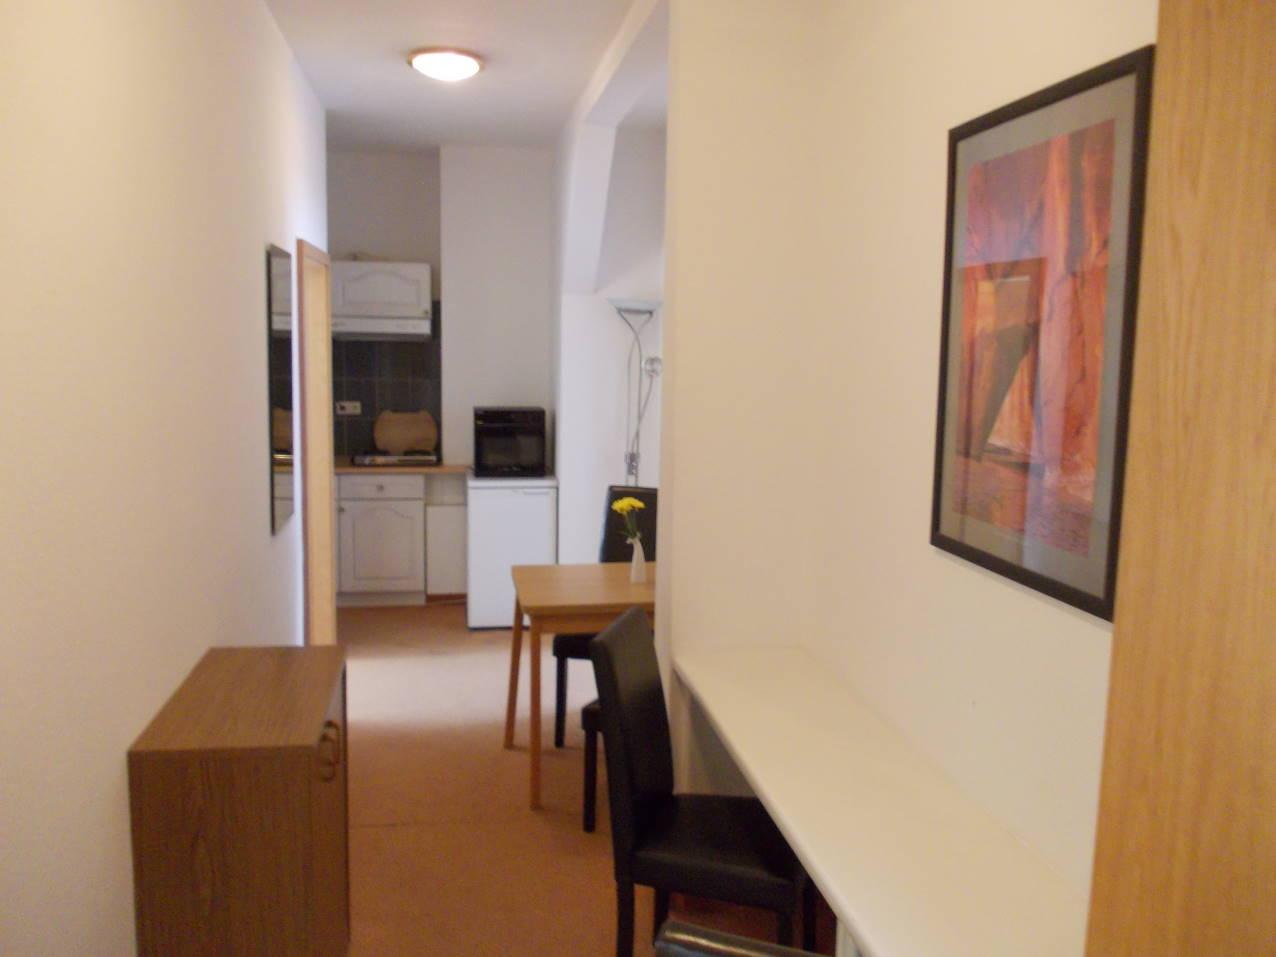 5-bett-appartement-mit-kueche6